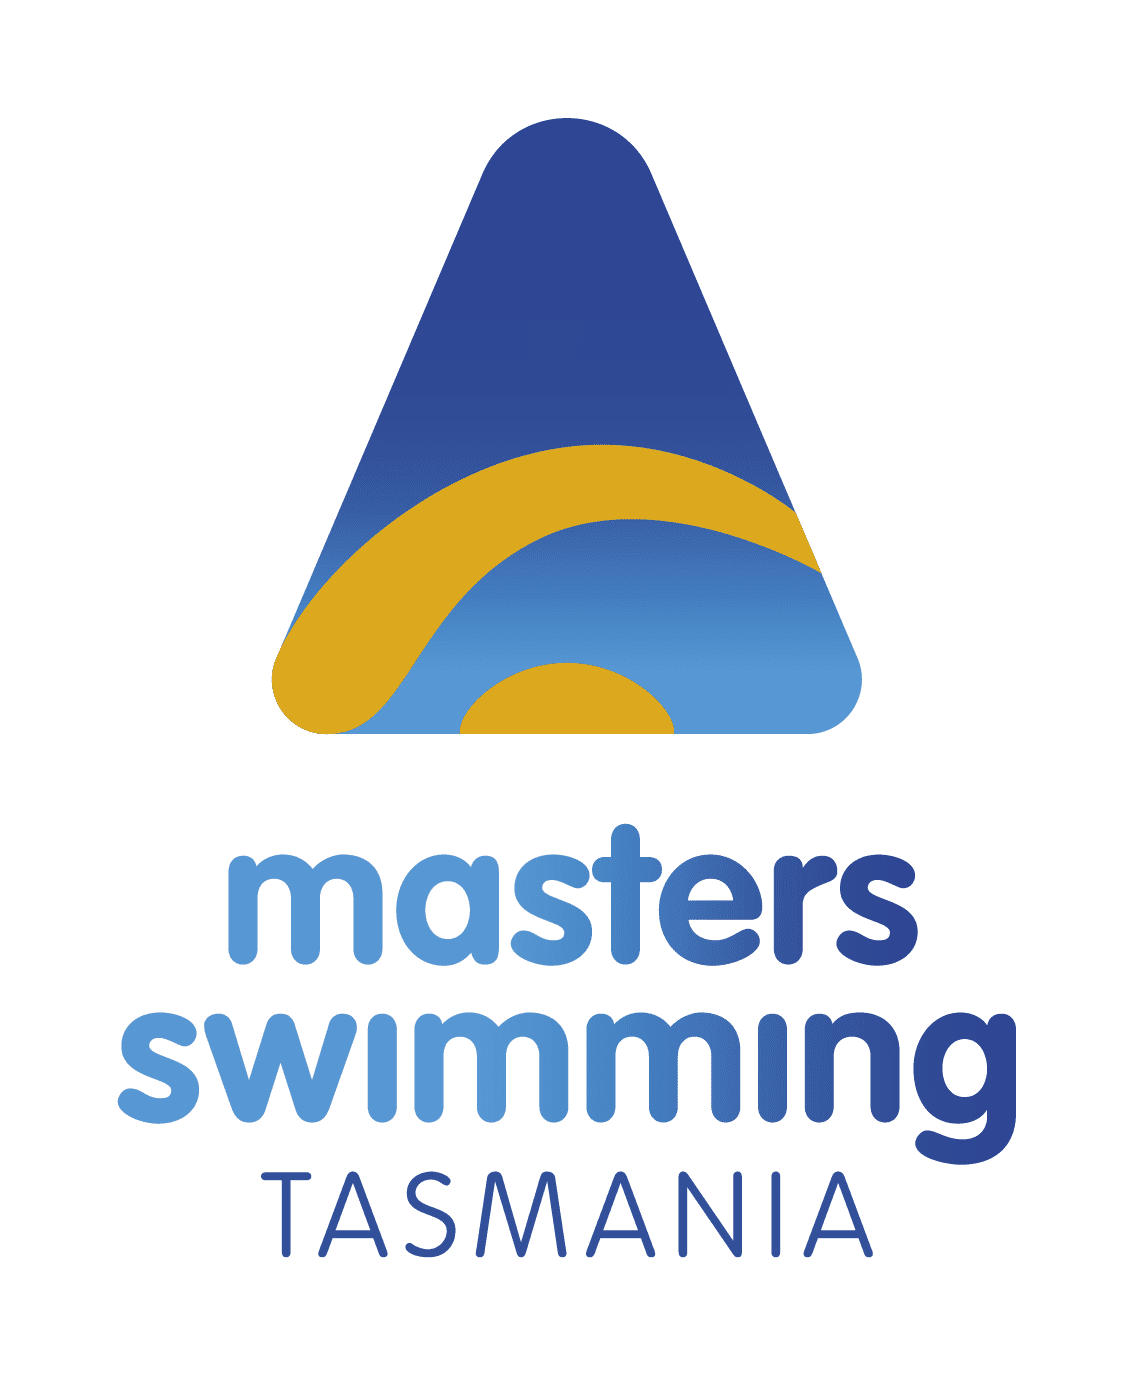 Masters Swimming TAS